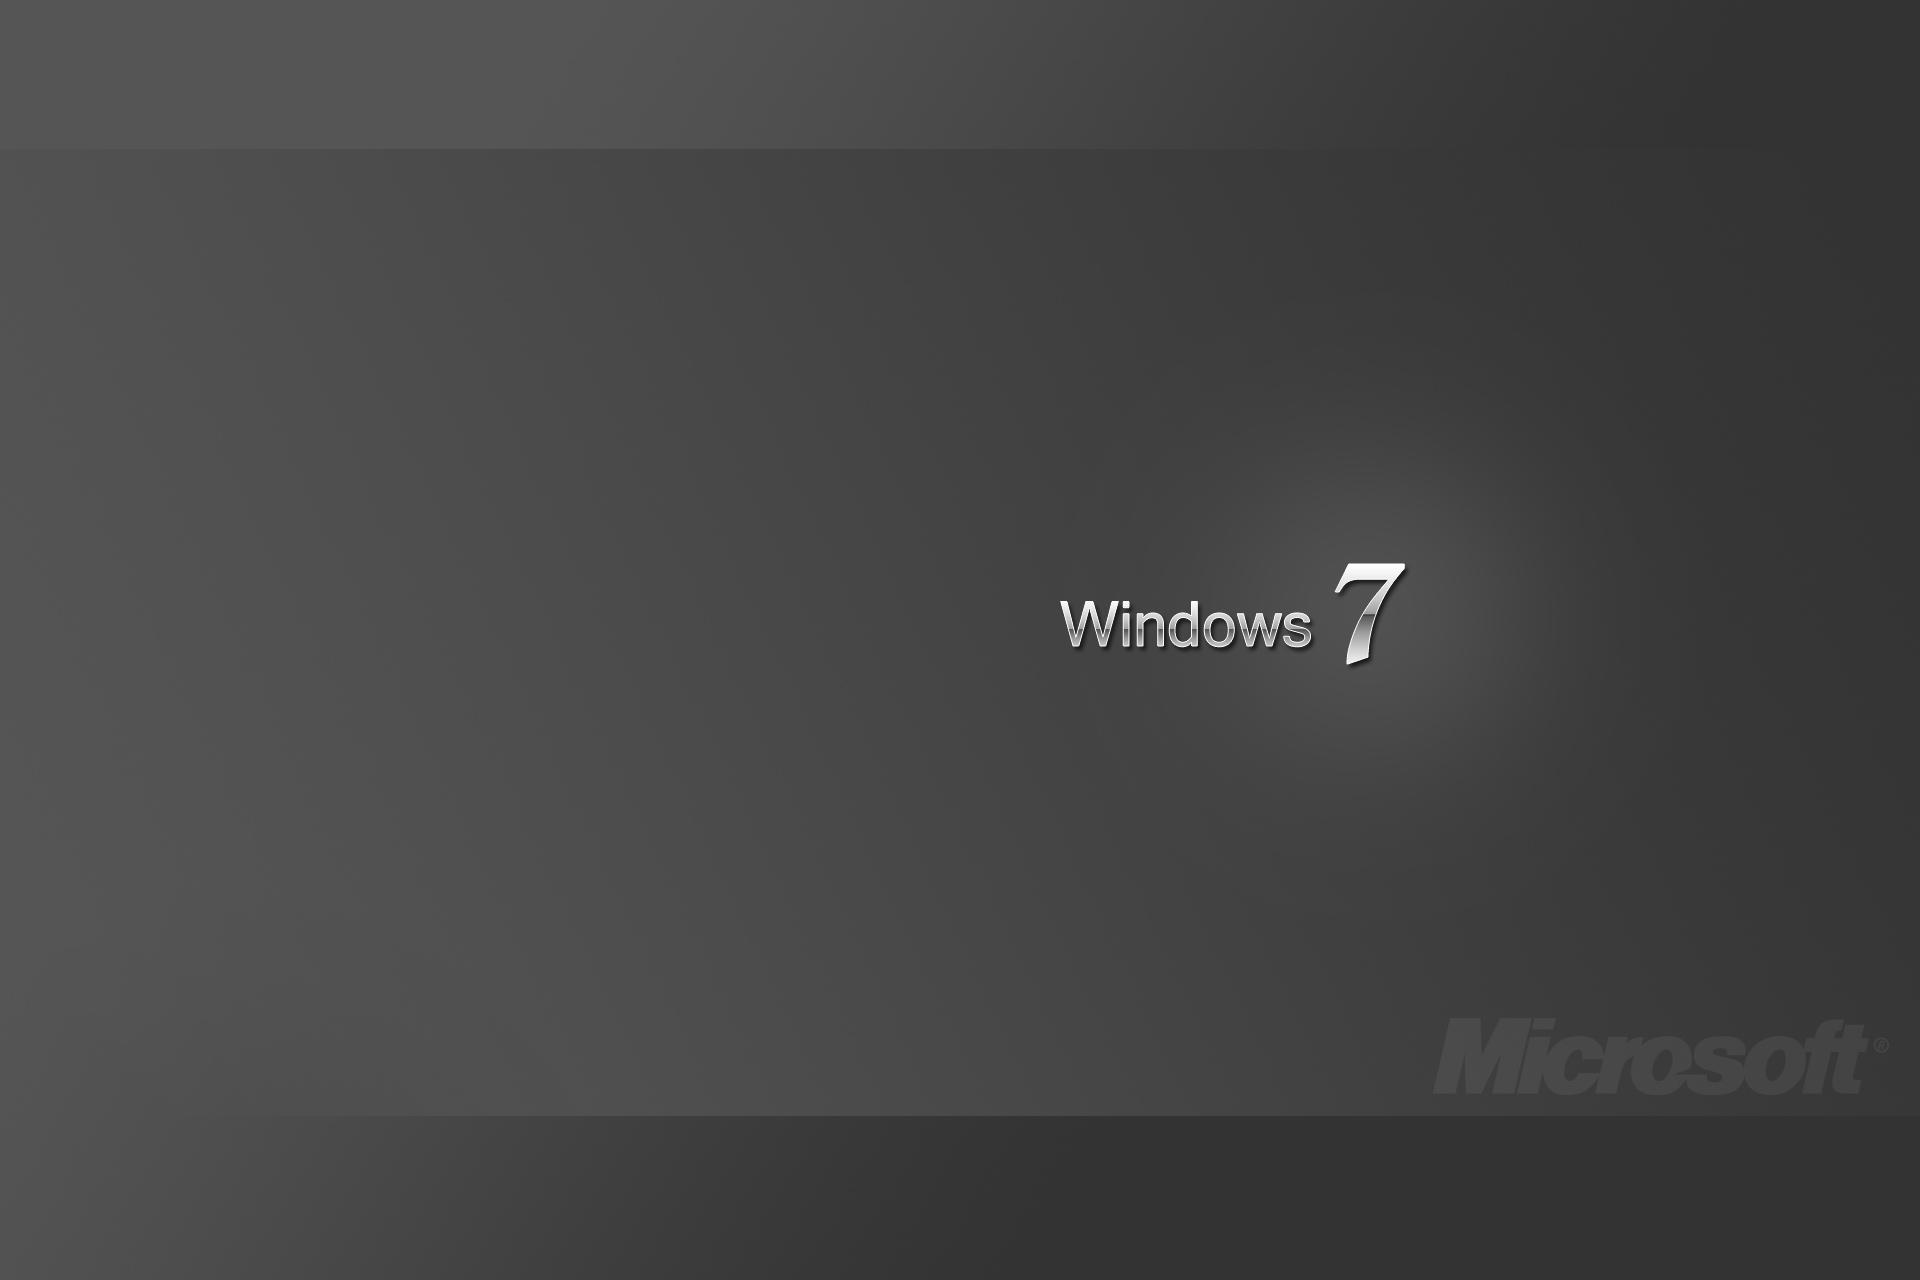 windows-seven-wallpaper-15